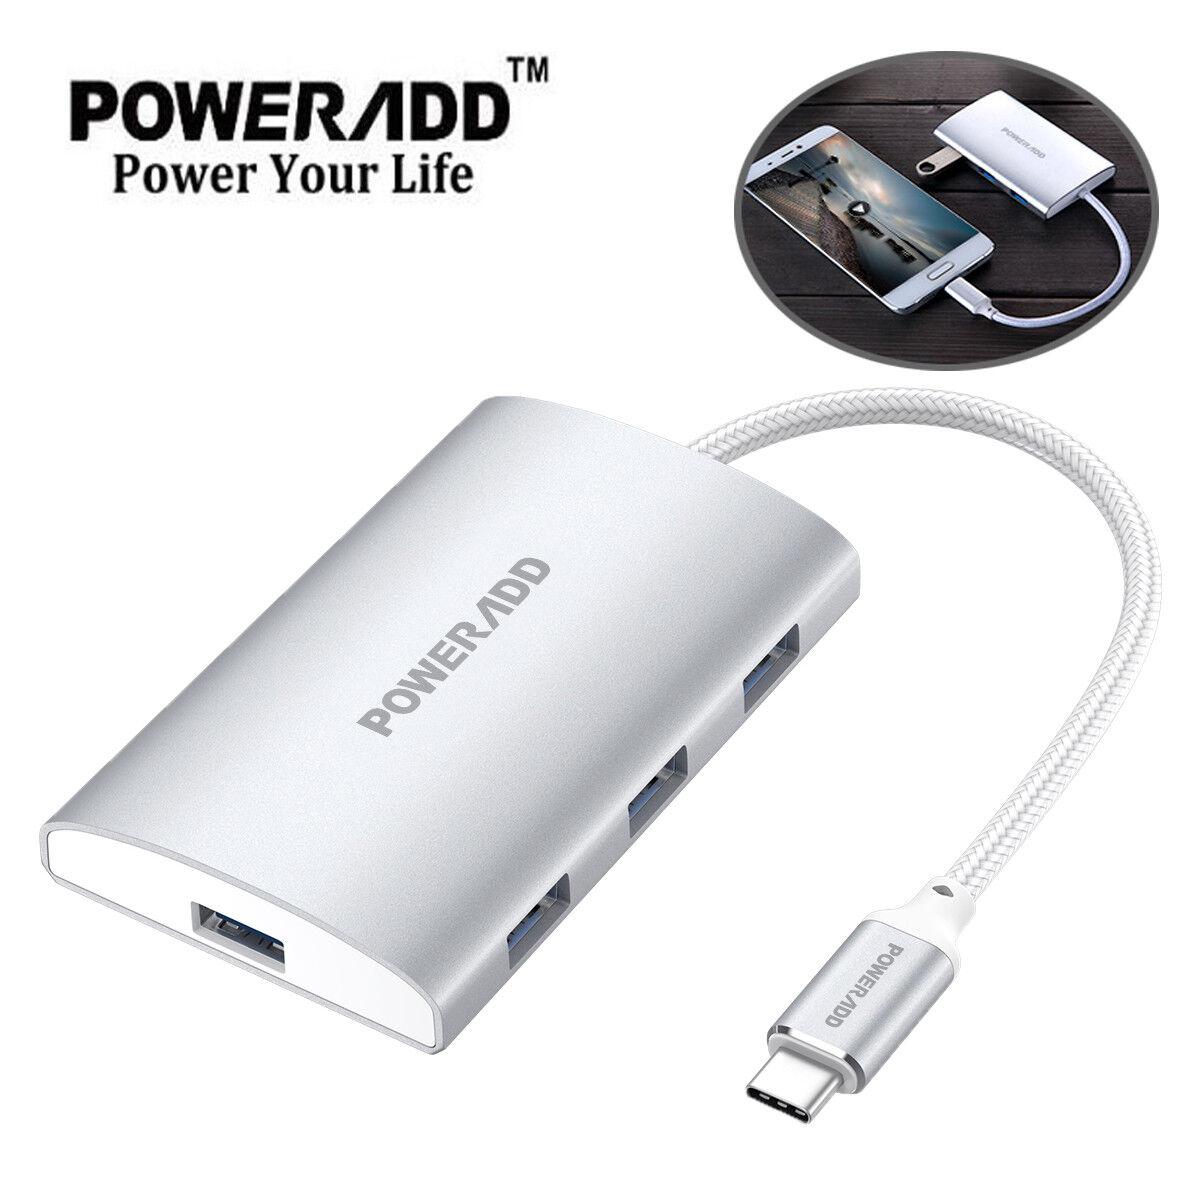 Poweradd Type C Adapter USB C Hub 4in1 USB-C 3.1 to 4K HDMI